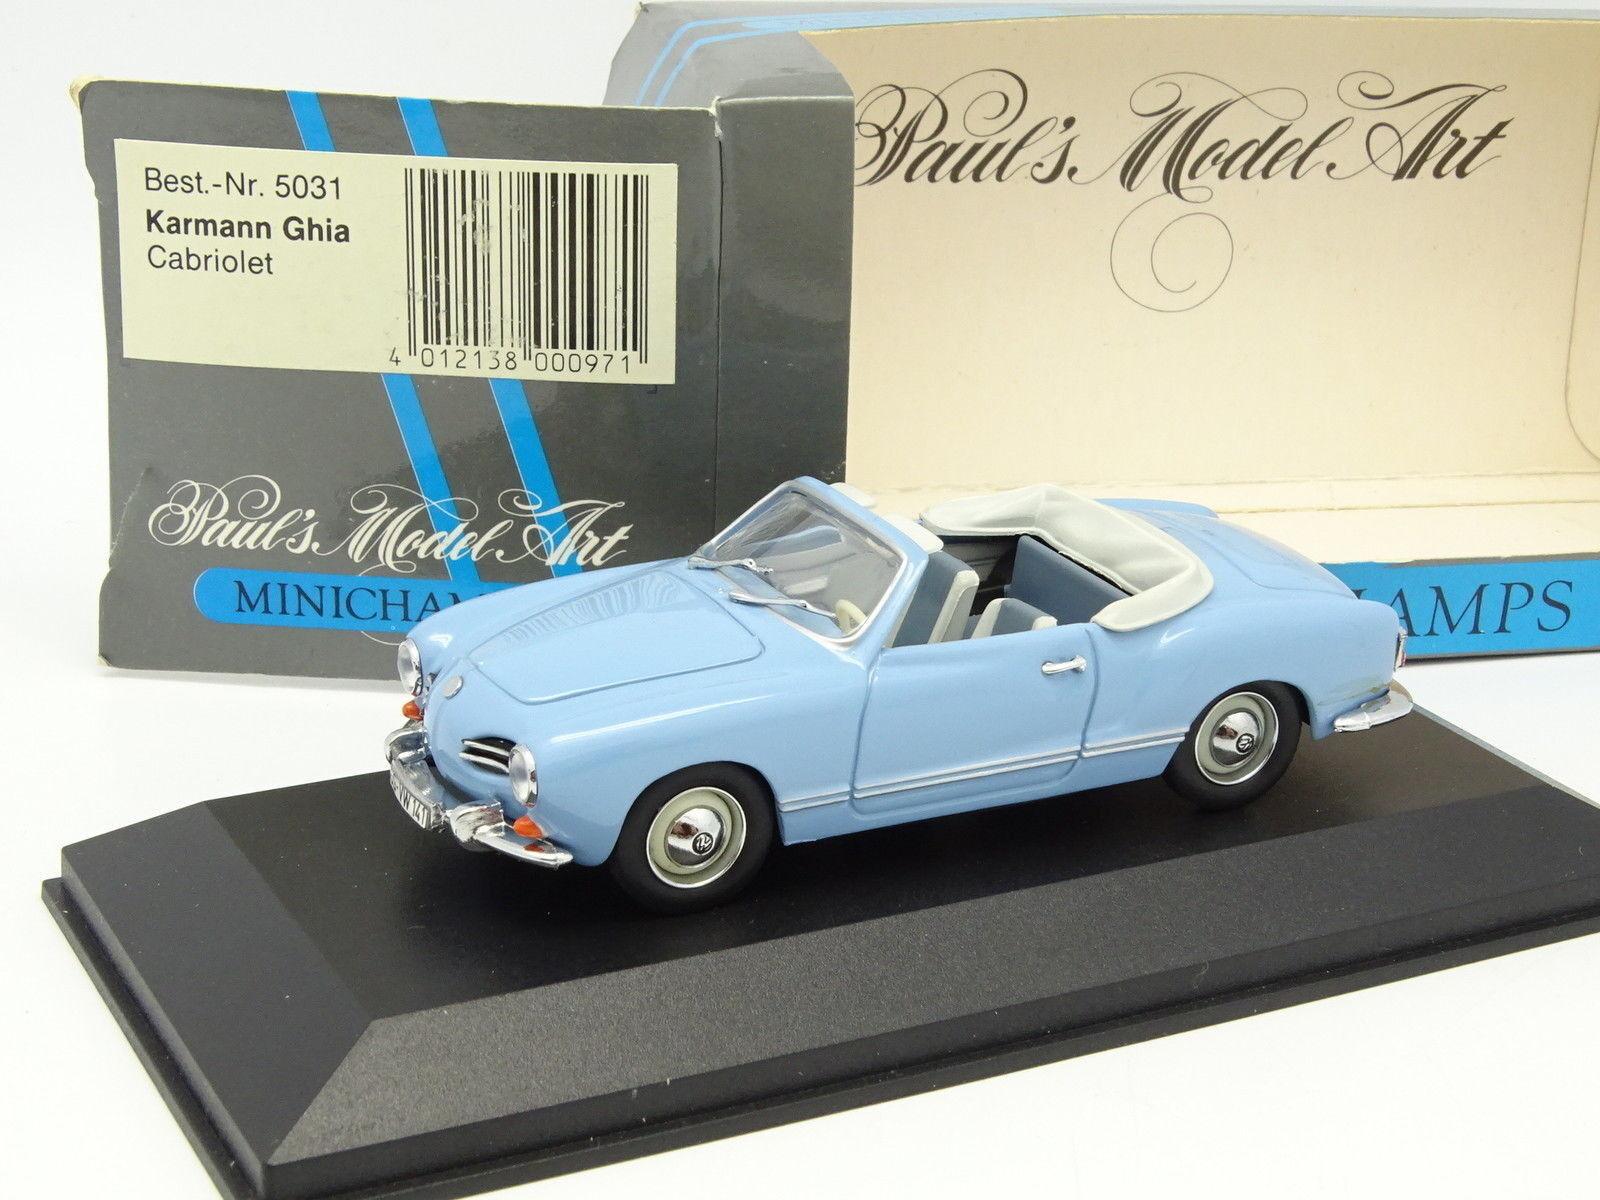 Minichamps 1 43 - VW Karmann Ghia Cabriolet blue Cielo